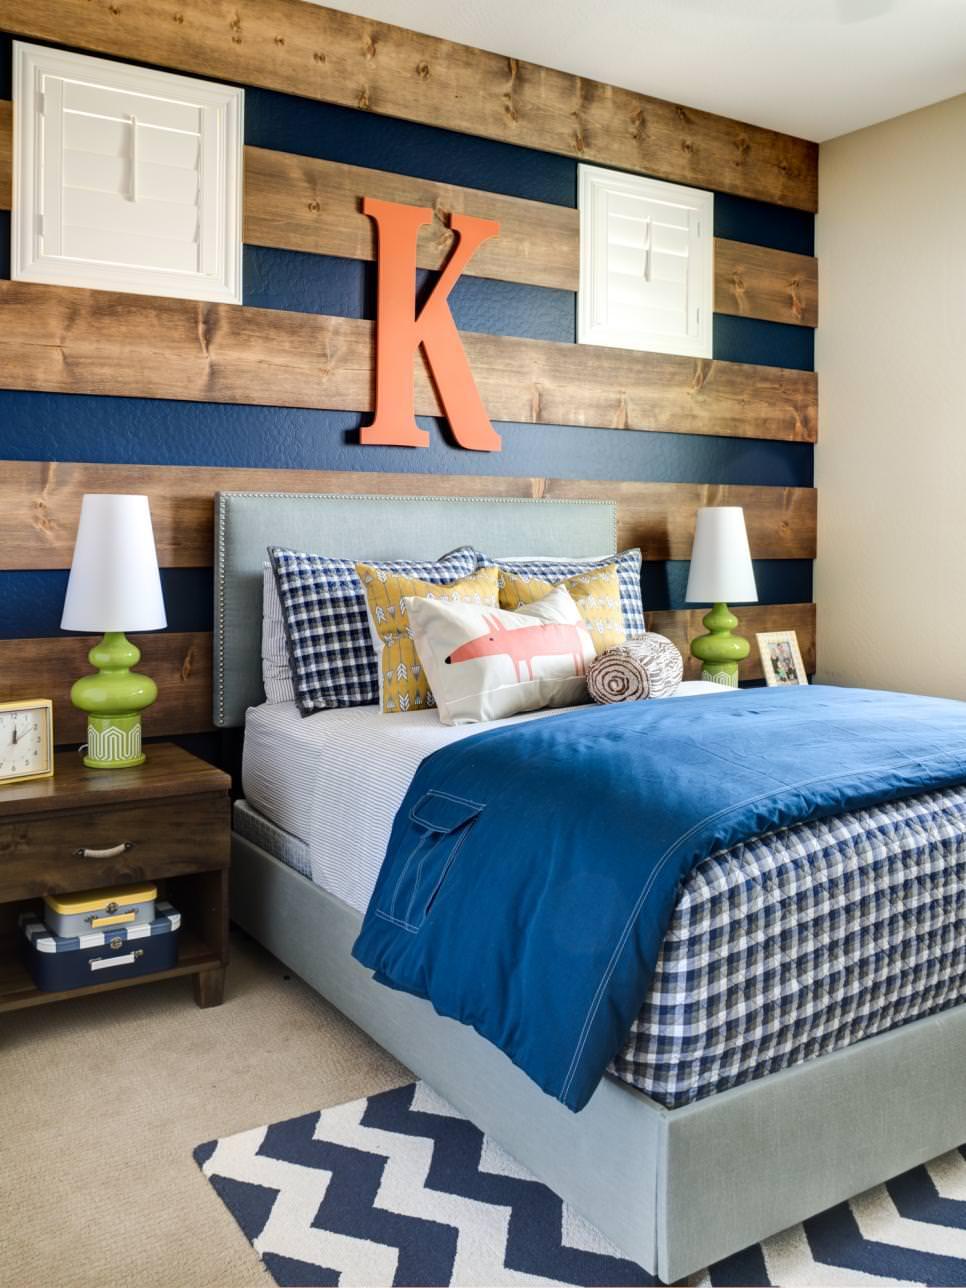 Amazing Wood Striped Bedroom Design